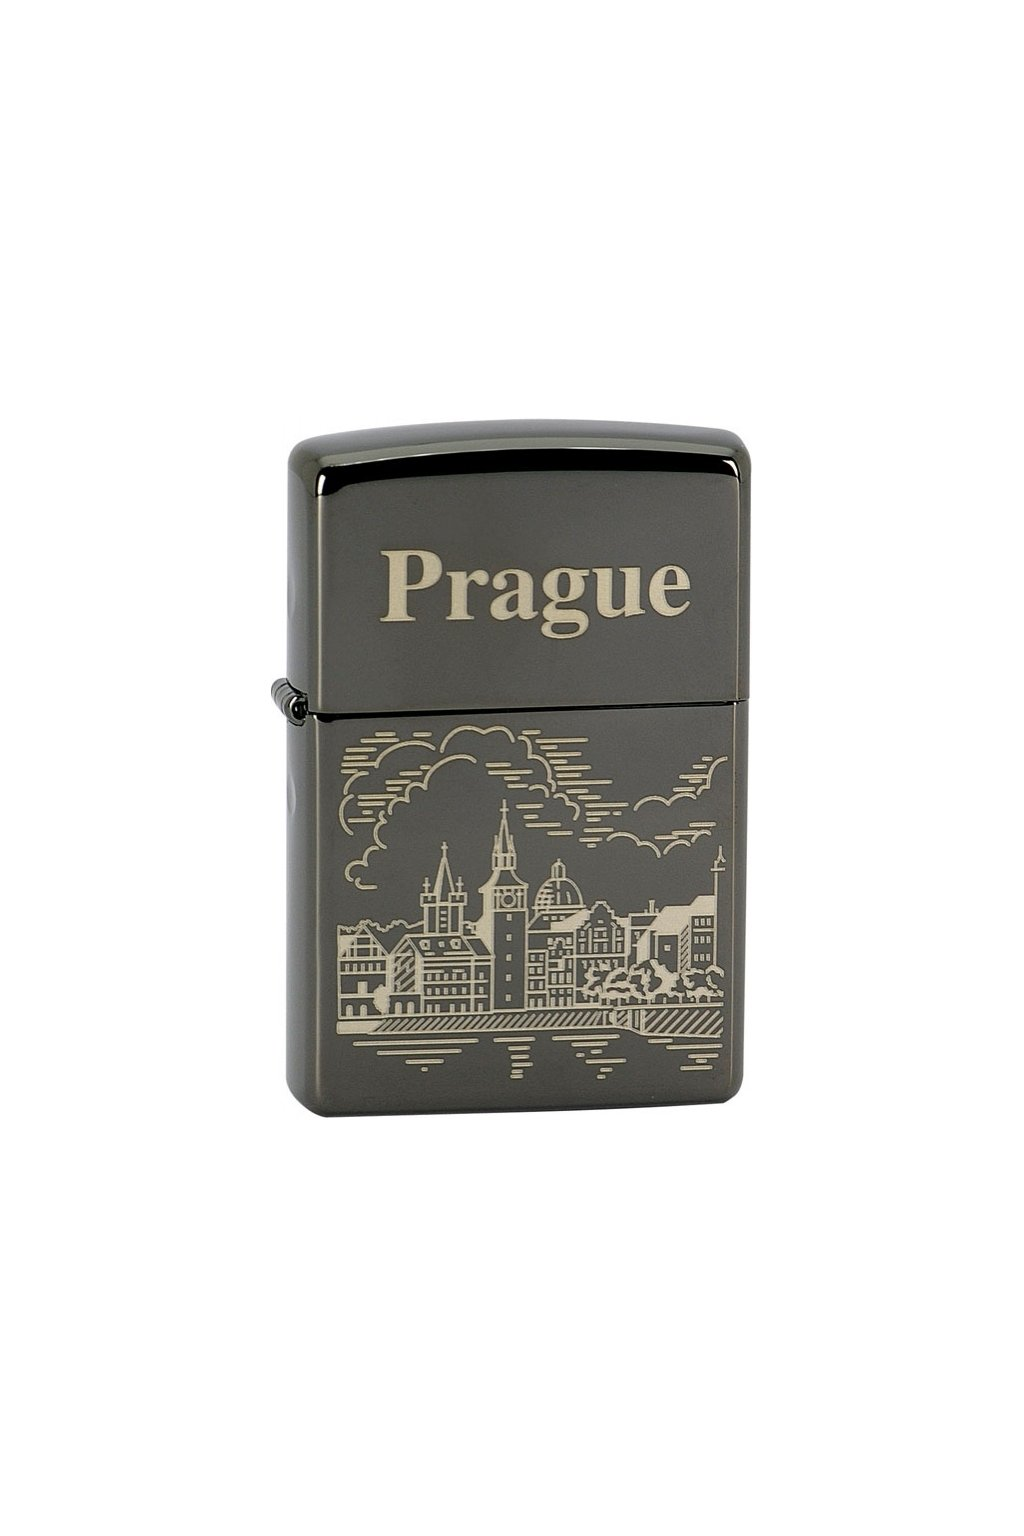 93872 zippo zapalovac 26560 prague